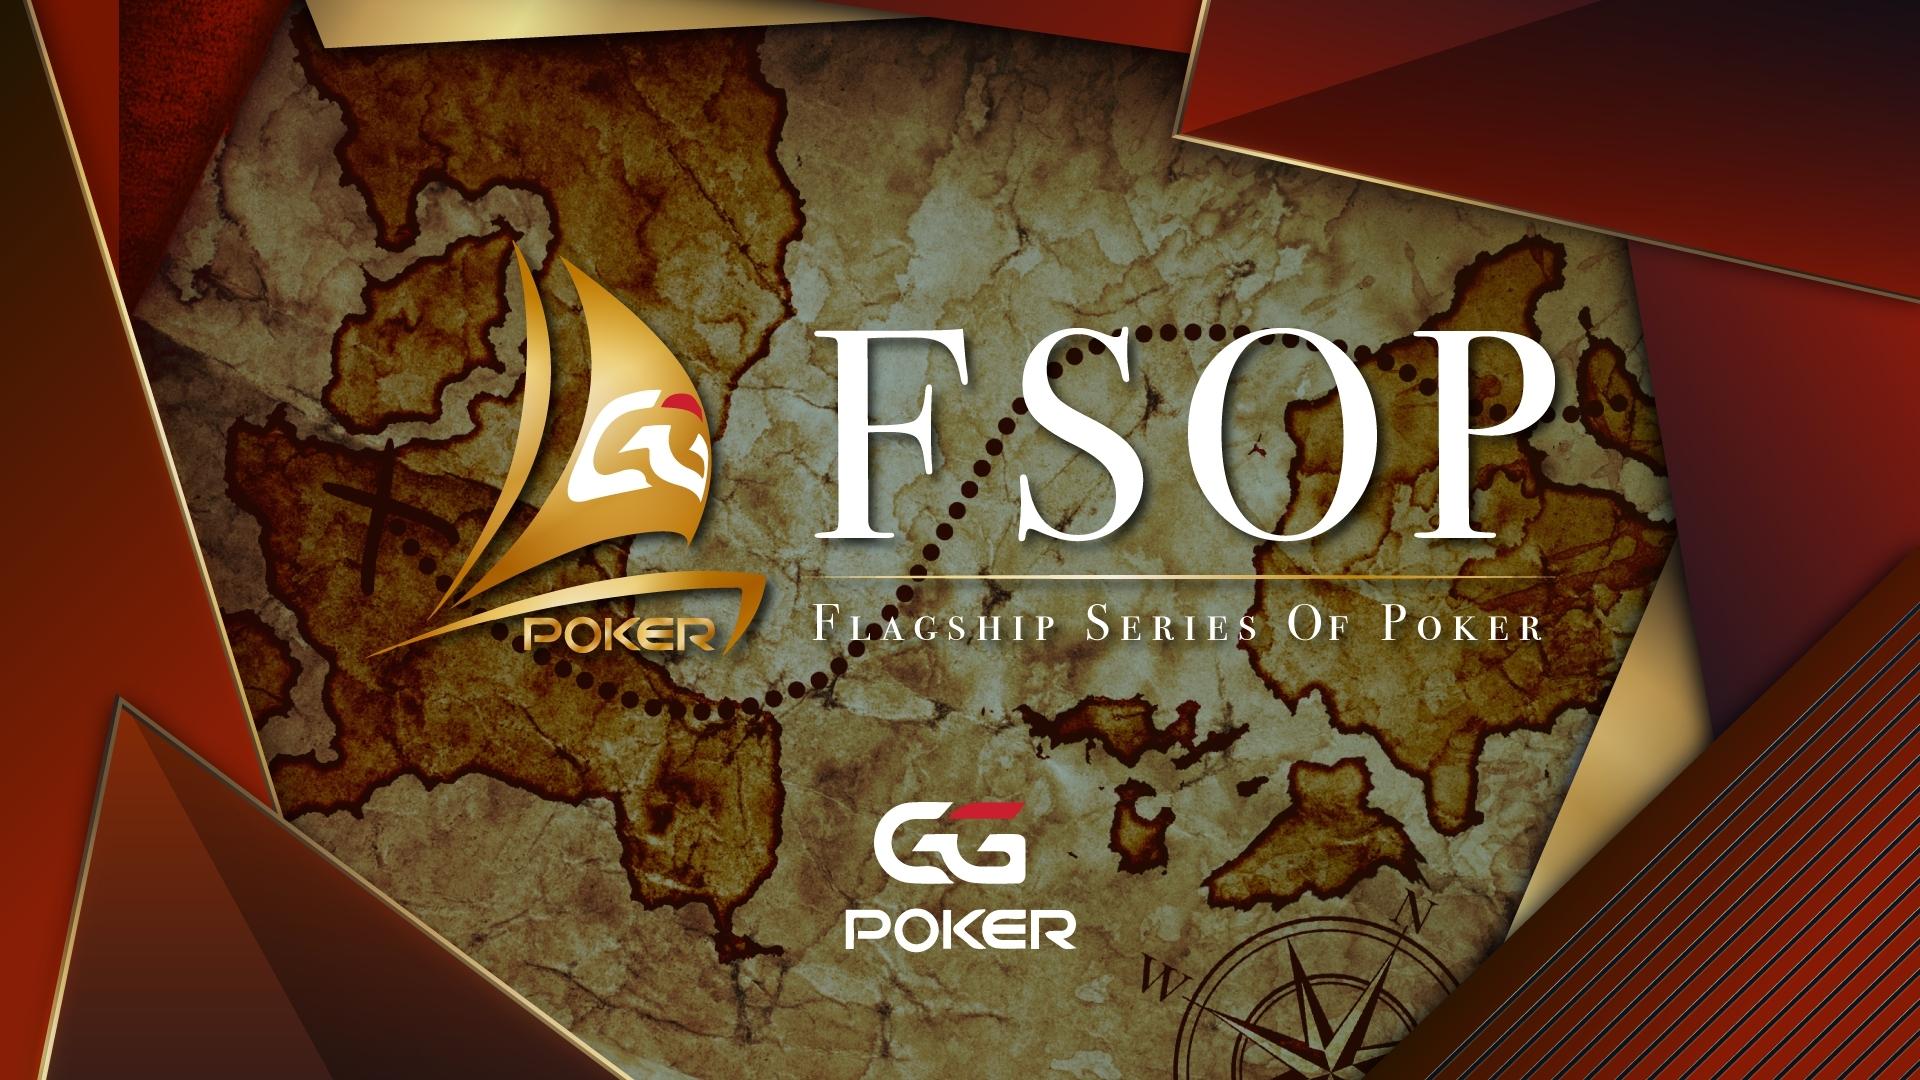 Flagship Series Of Poker